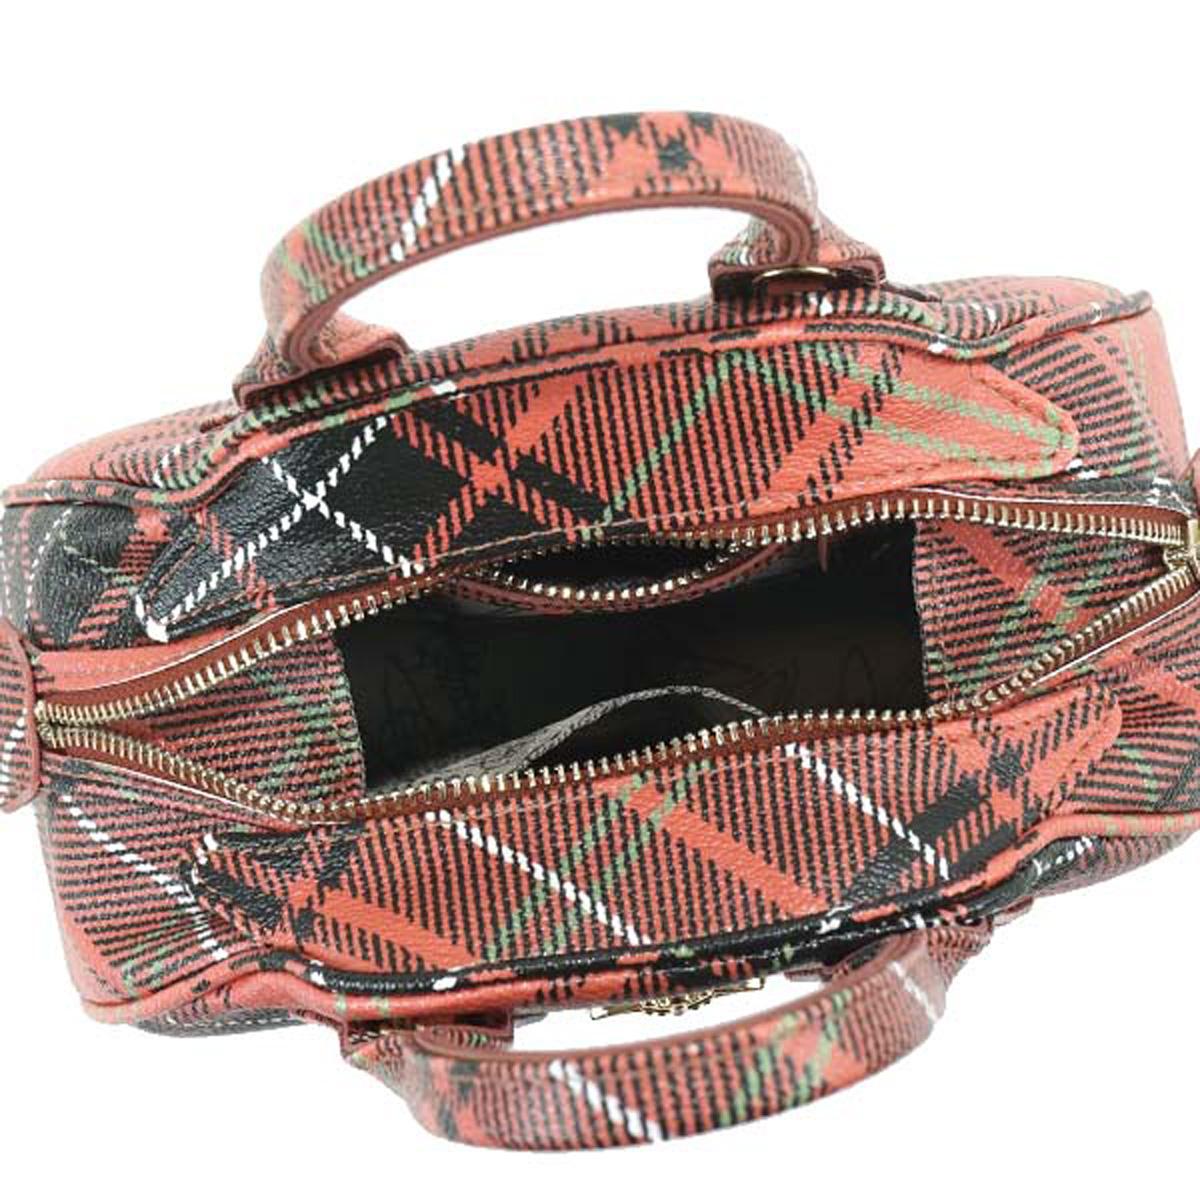 79c92213a3 ... It is shoulder bag CHARLOTTE red system tartan checked pattern at Vivien  waist Wood Vivienne Westwood ...